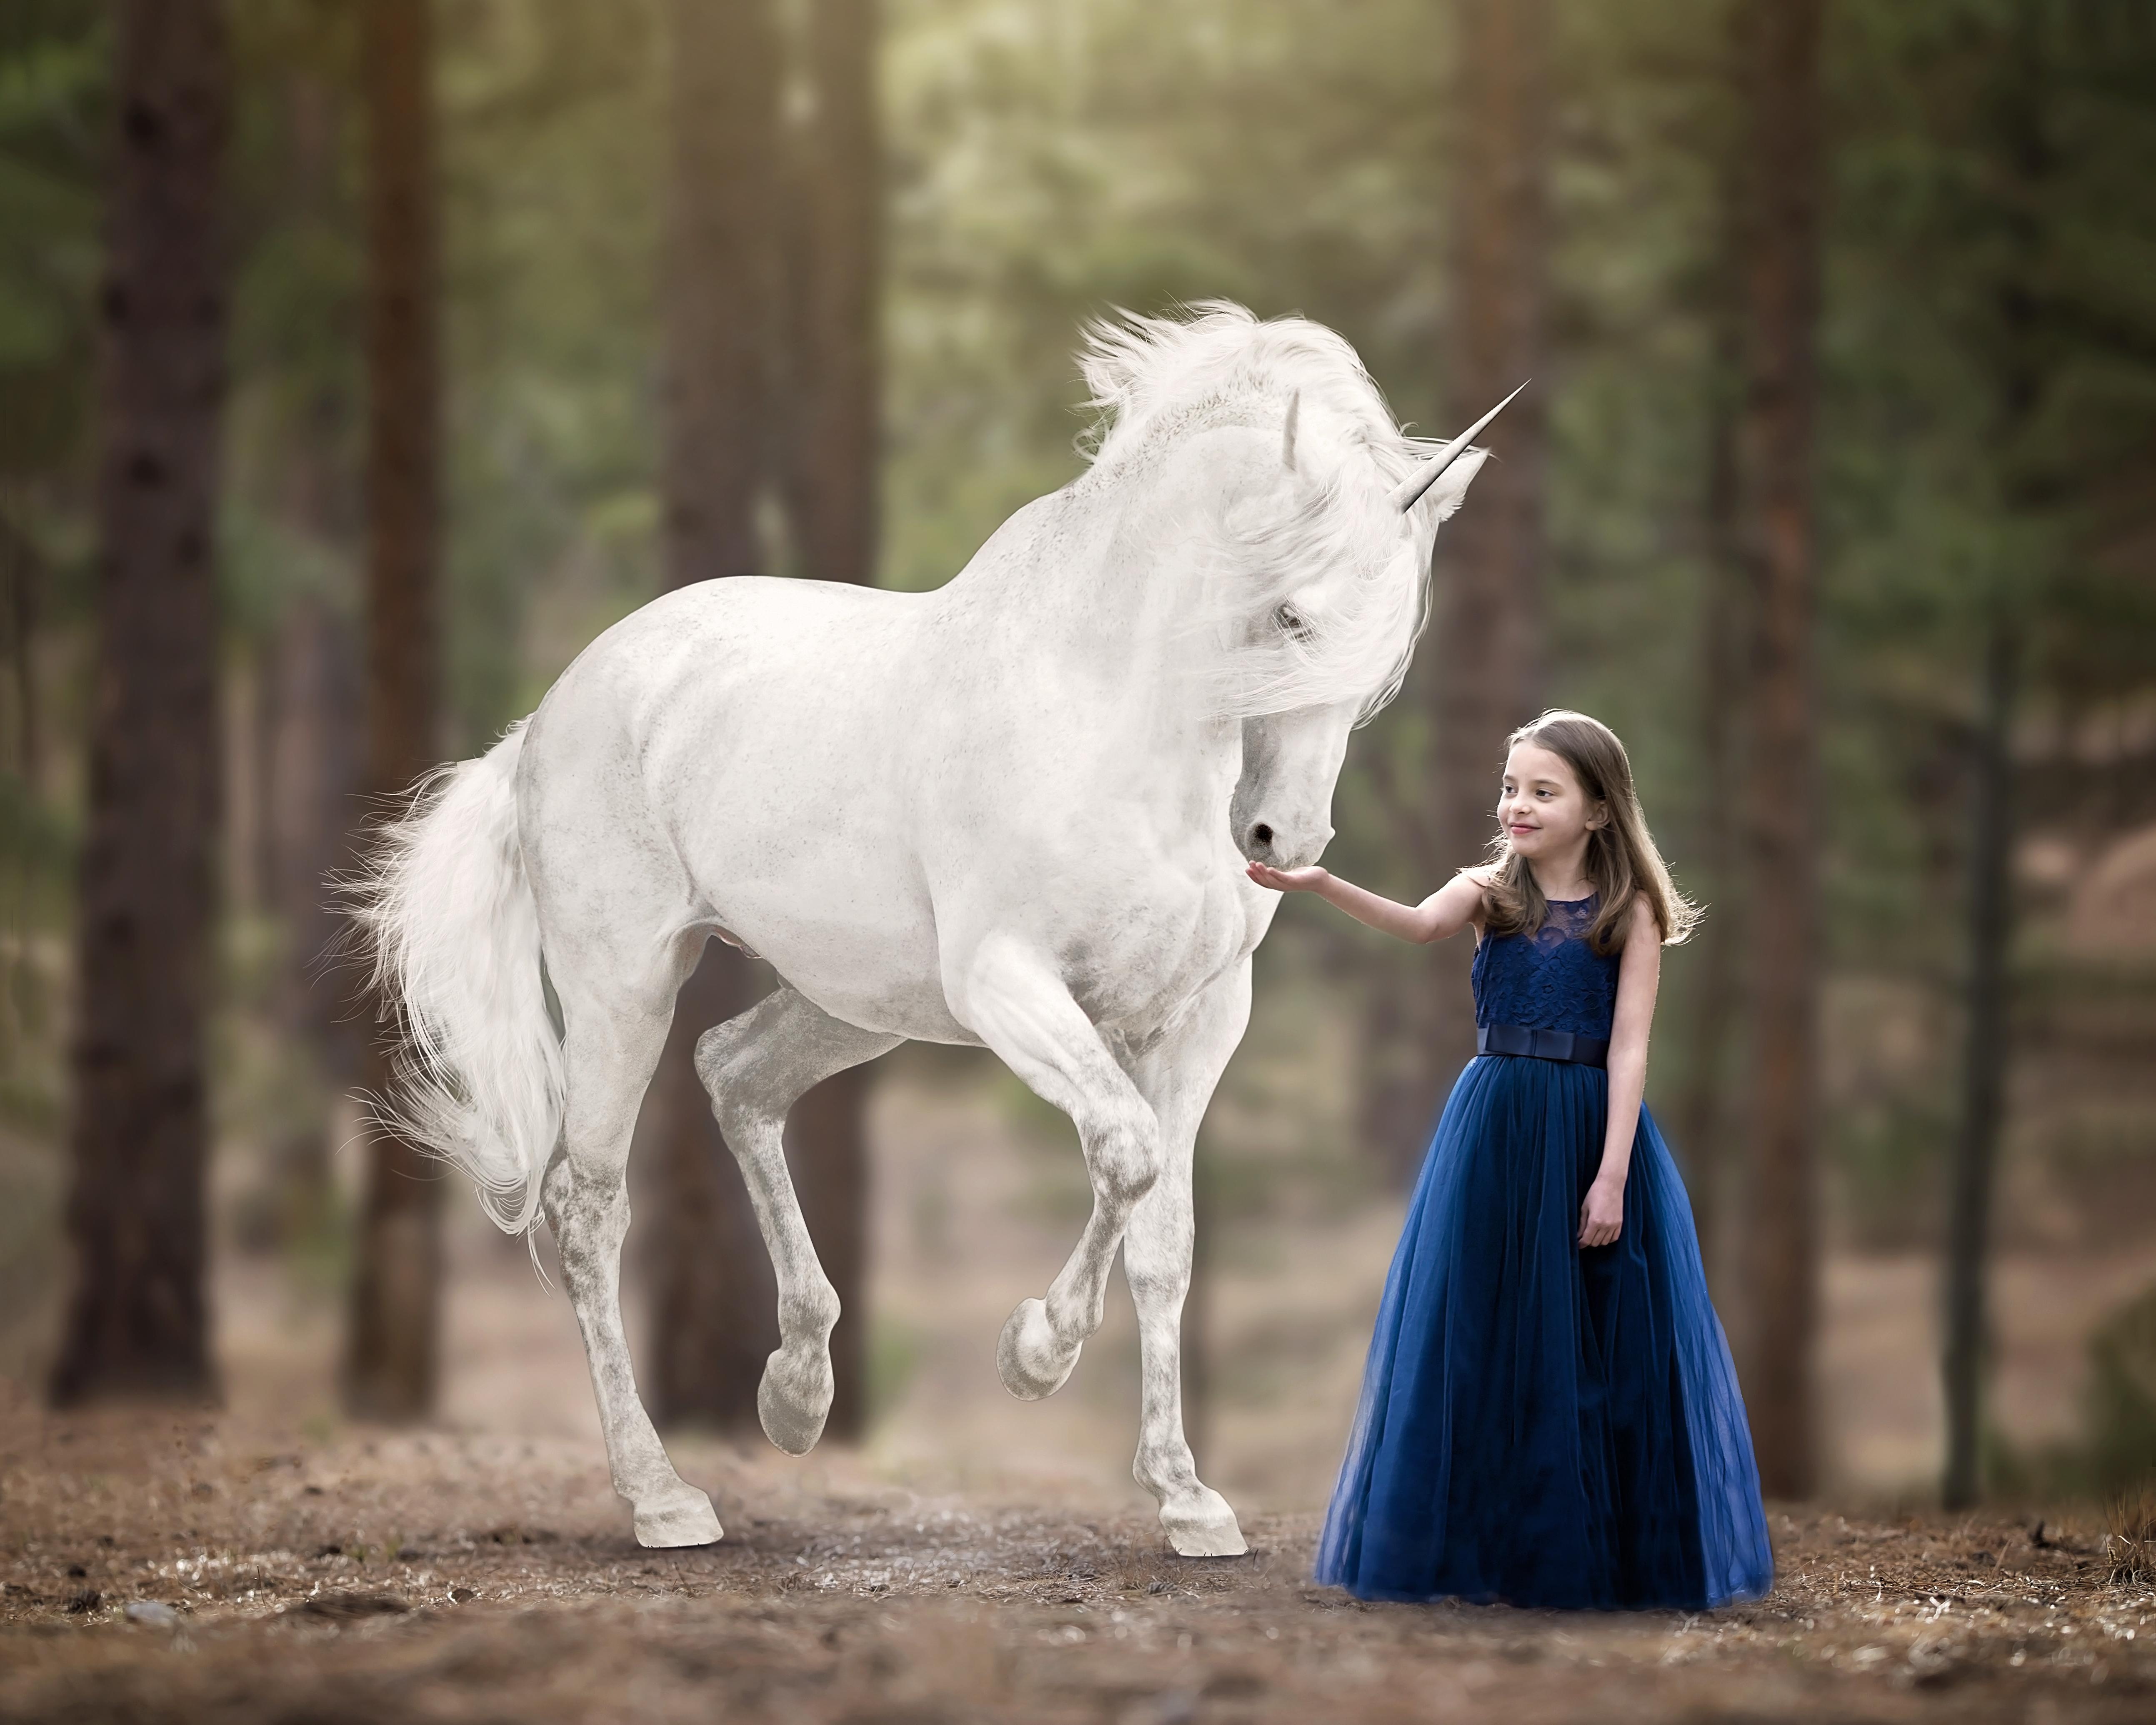 Sweet Girl and Unicorn Imagination